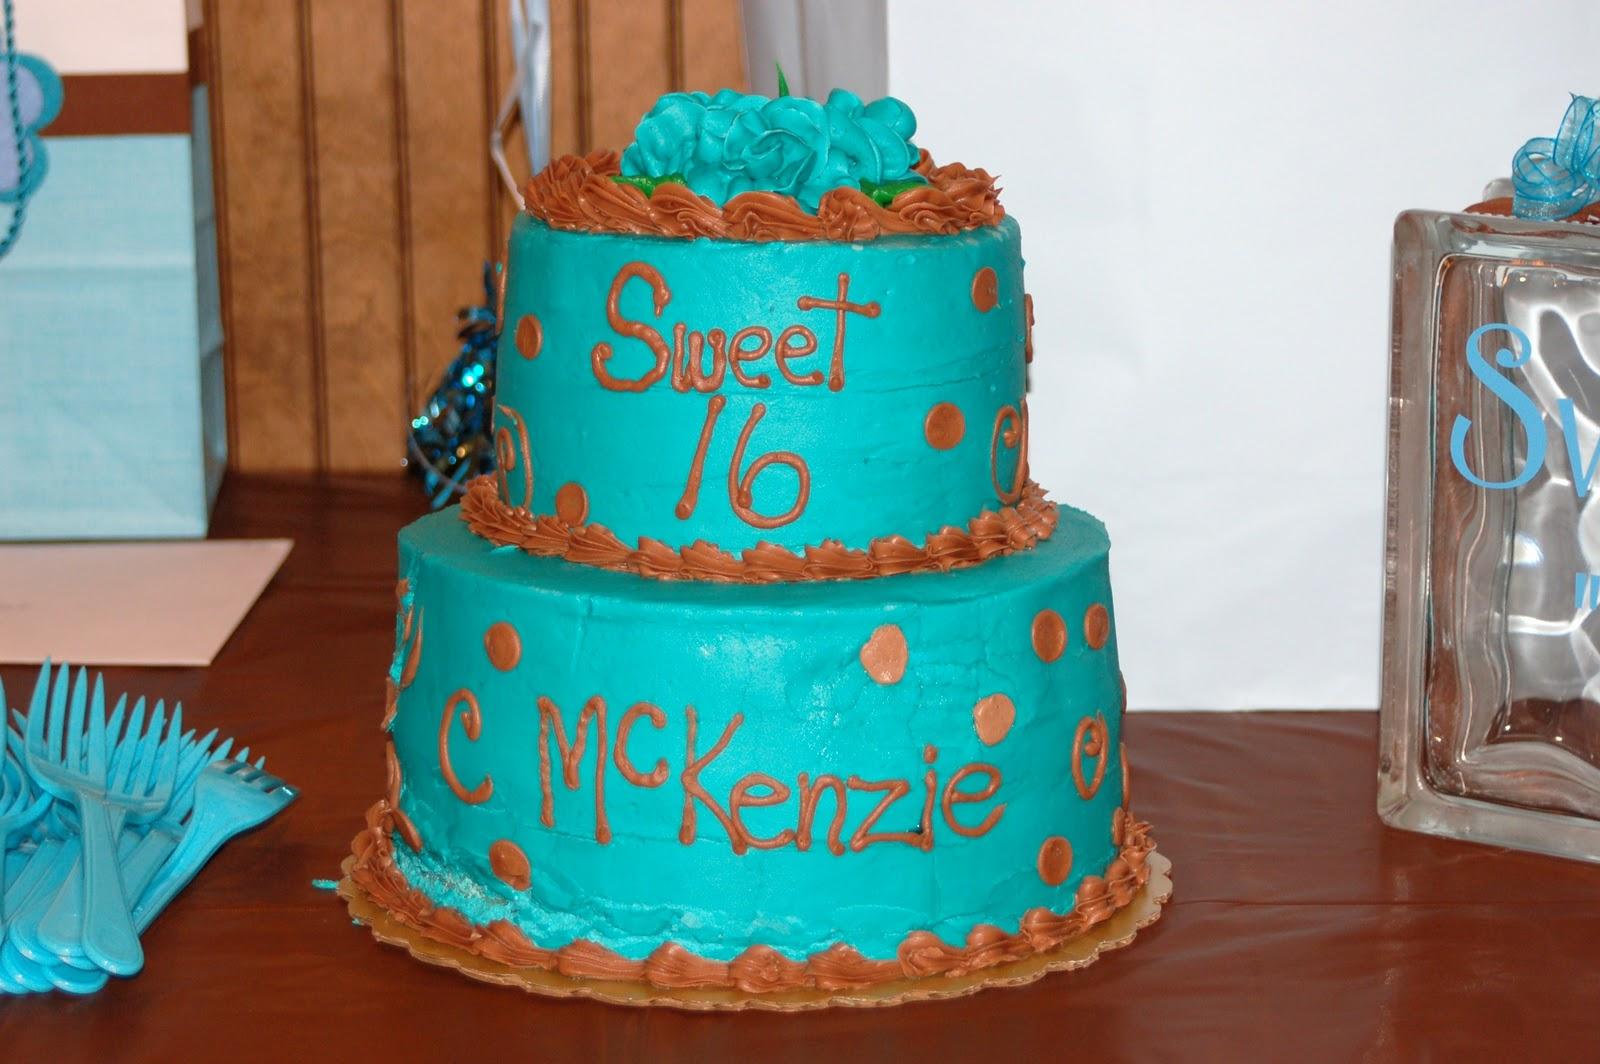 Amazing 16th Birthday Cakes 404 - Not Found